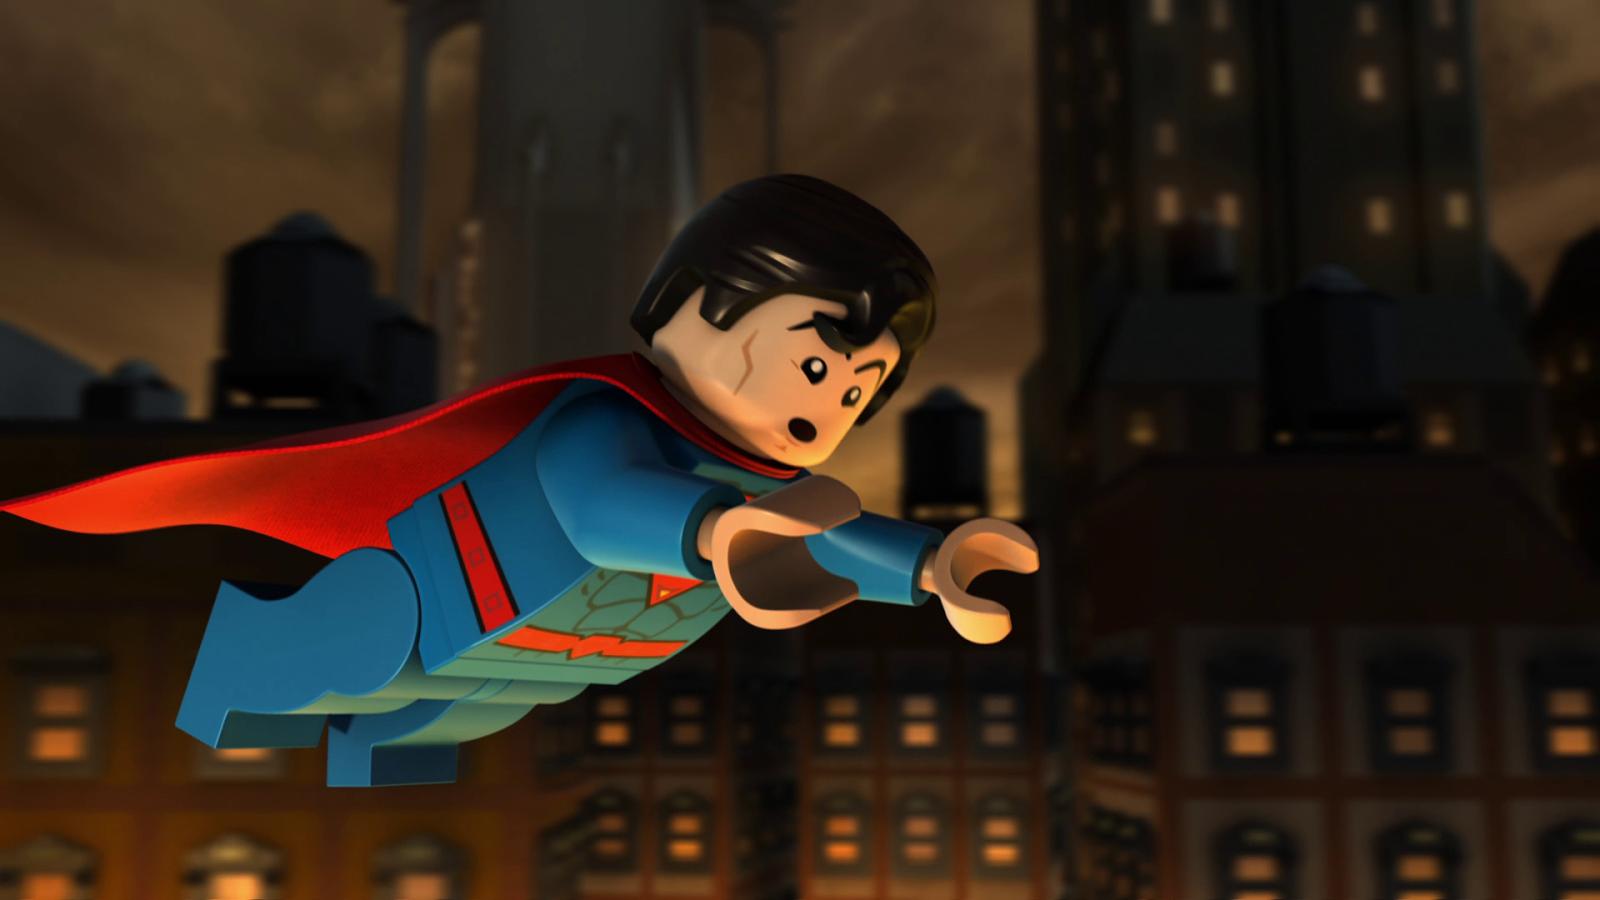 Lego DC Comics Superheroes Justice League - Gotham City Breakout (2016) 1080p BD25 3